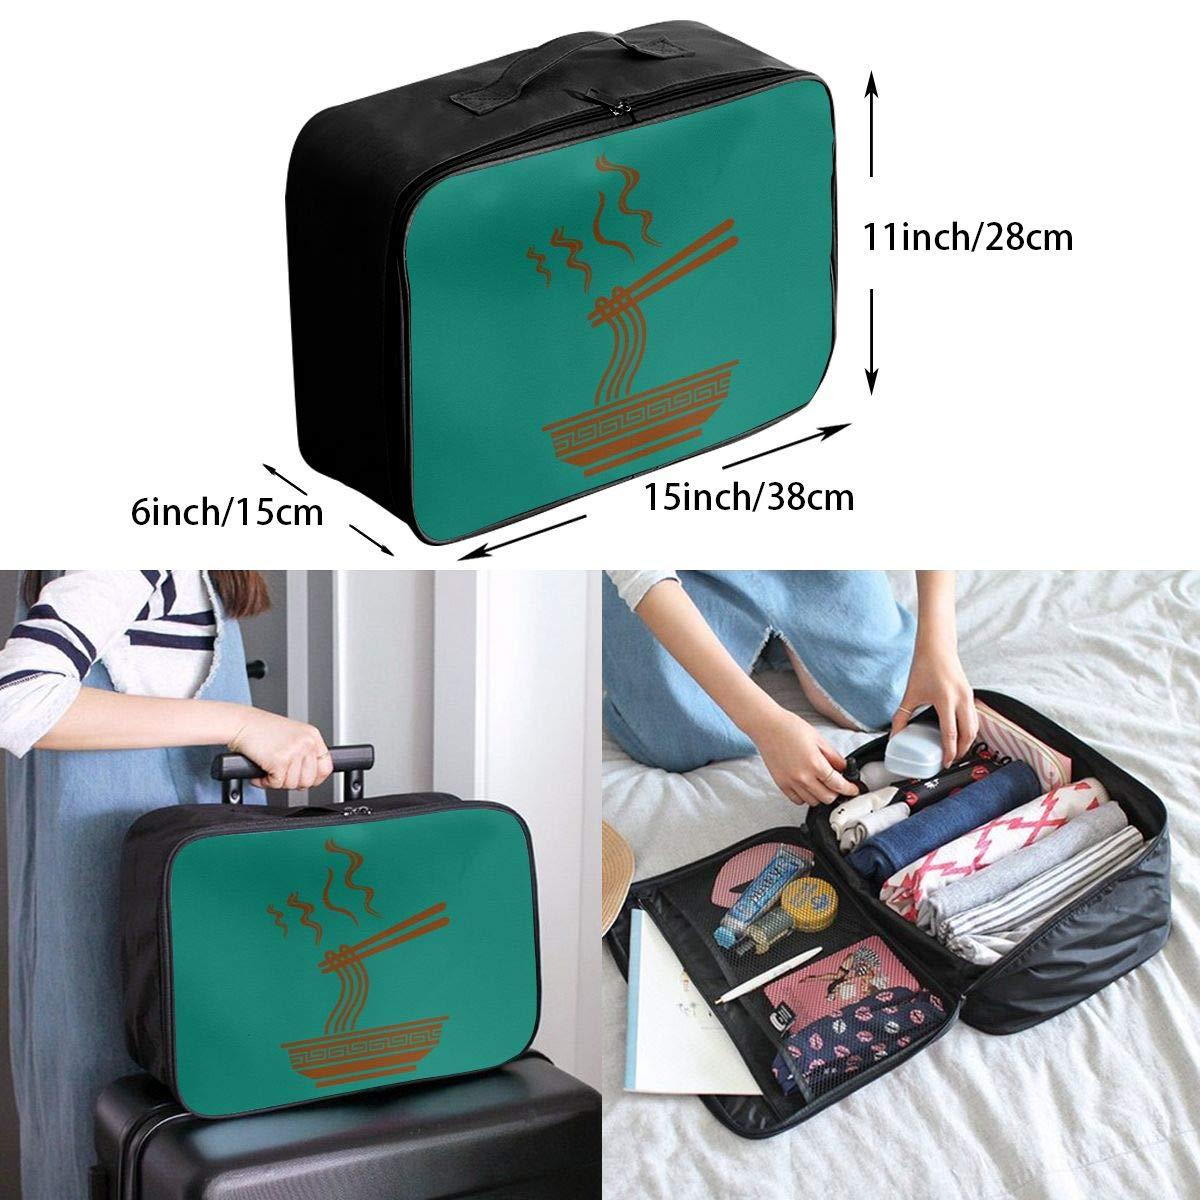 Travel Luggage Duffle Bag Lightweight Portable Handbag Ramen Noodles Large Capacity Waterproof Foldable Storage Tote